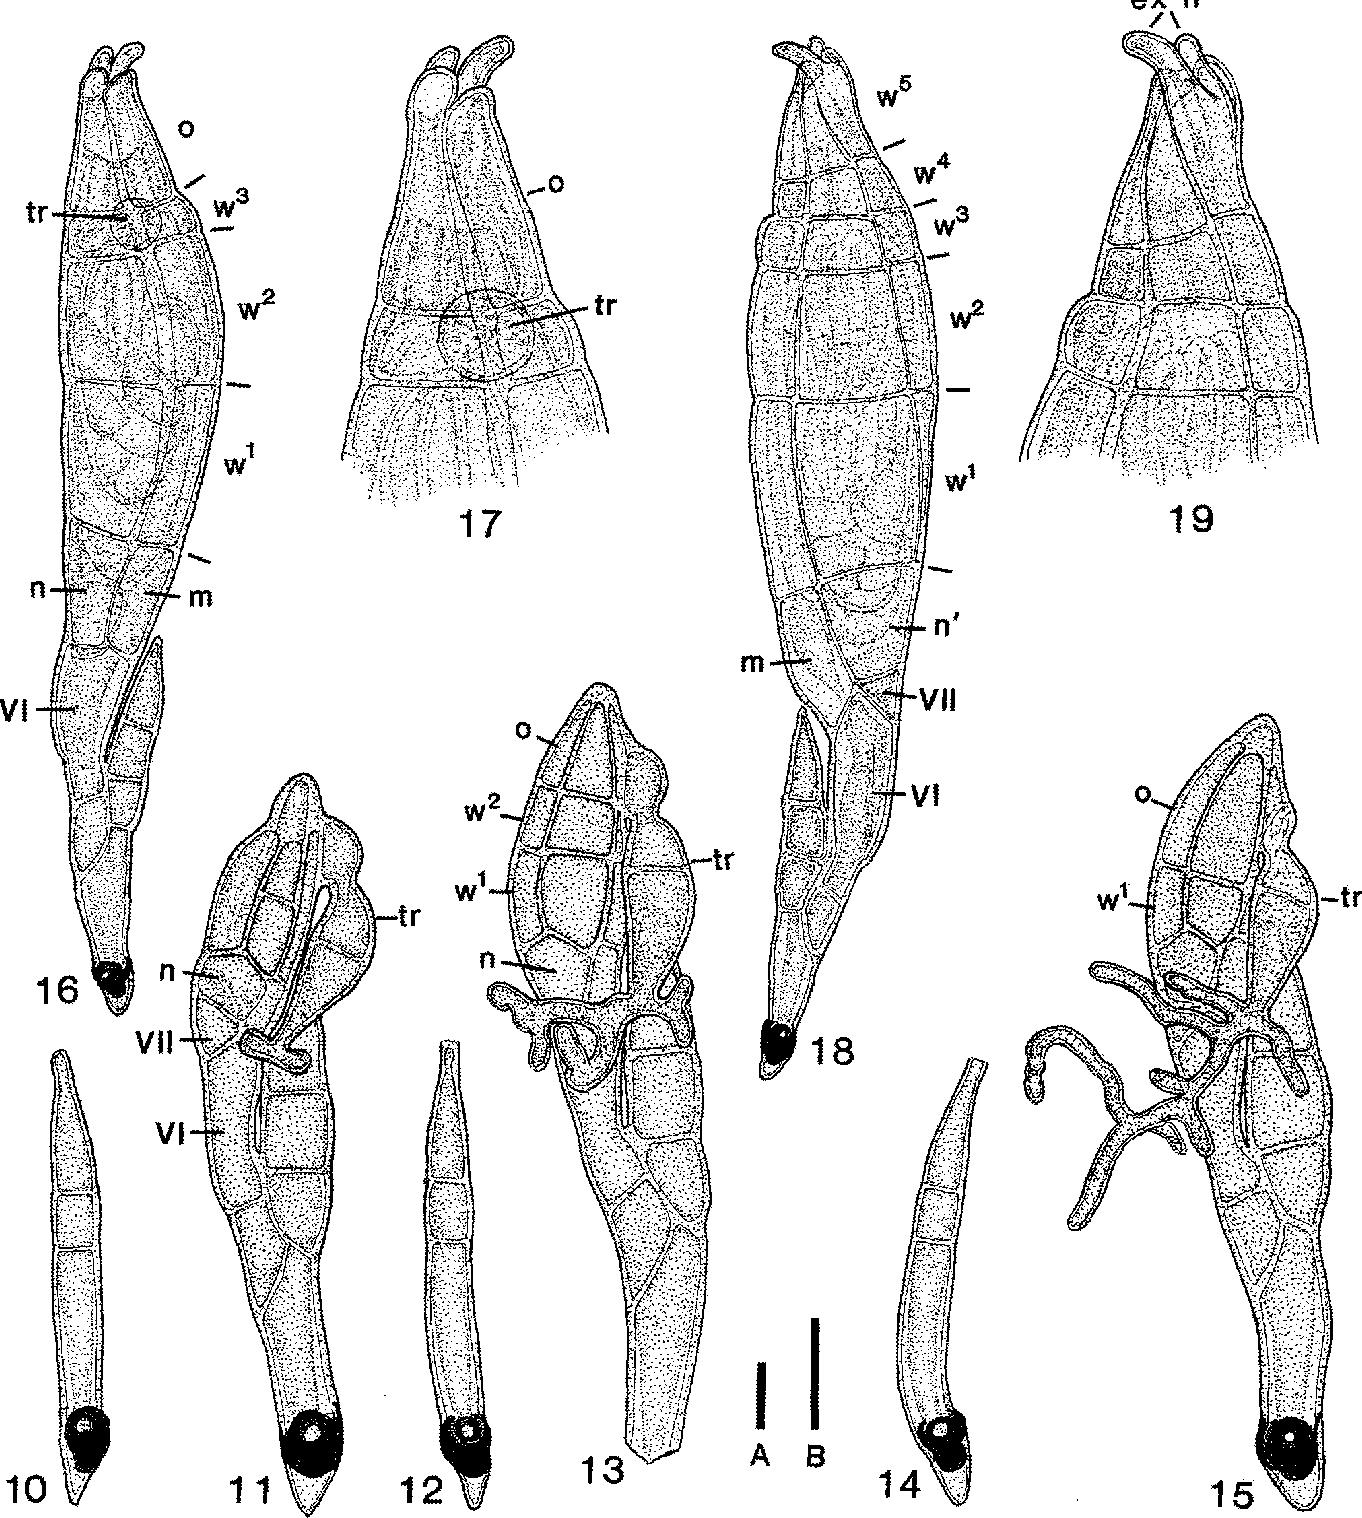 figure 10-19